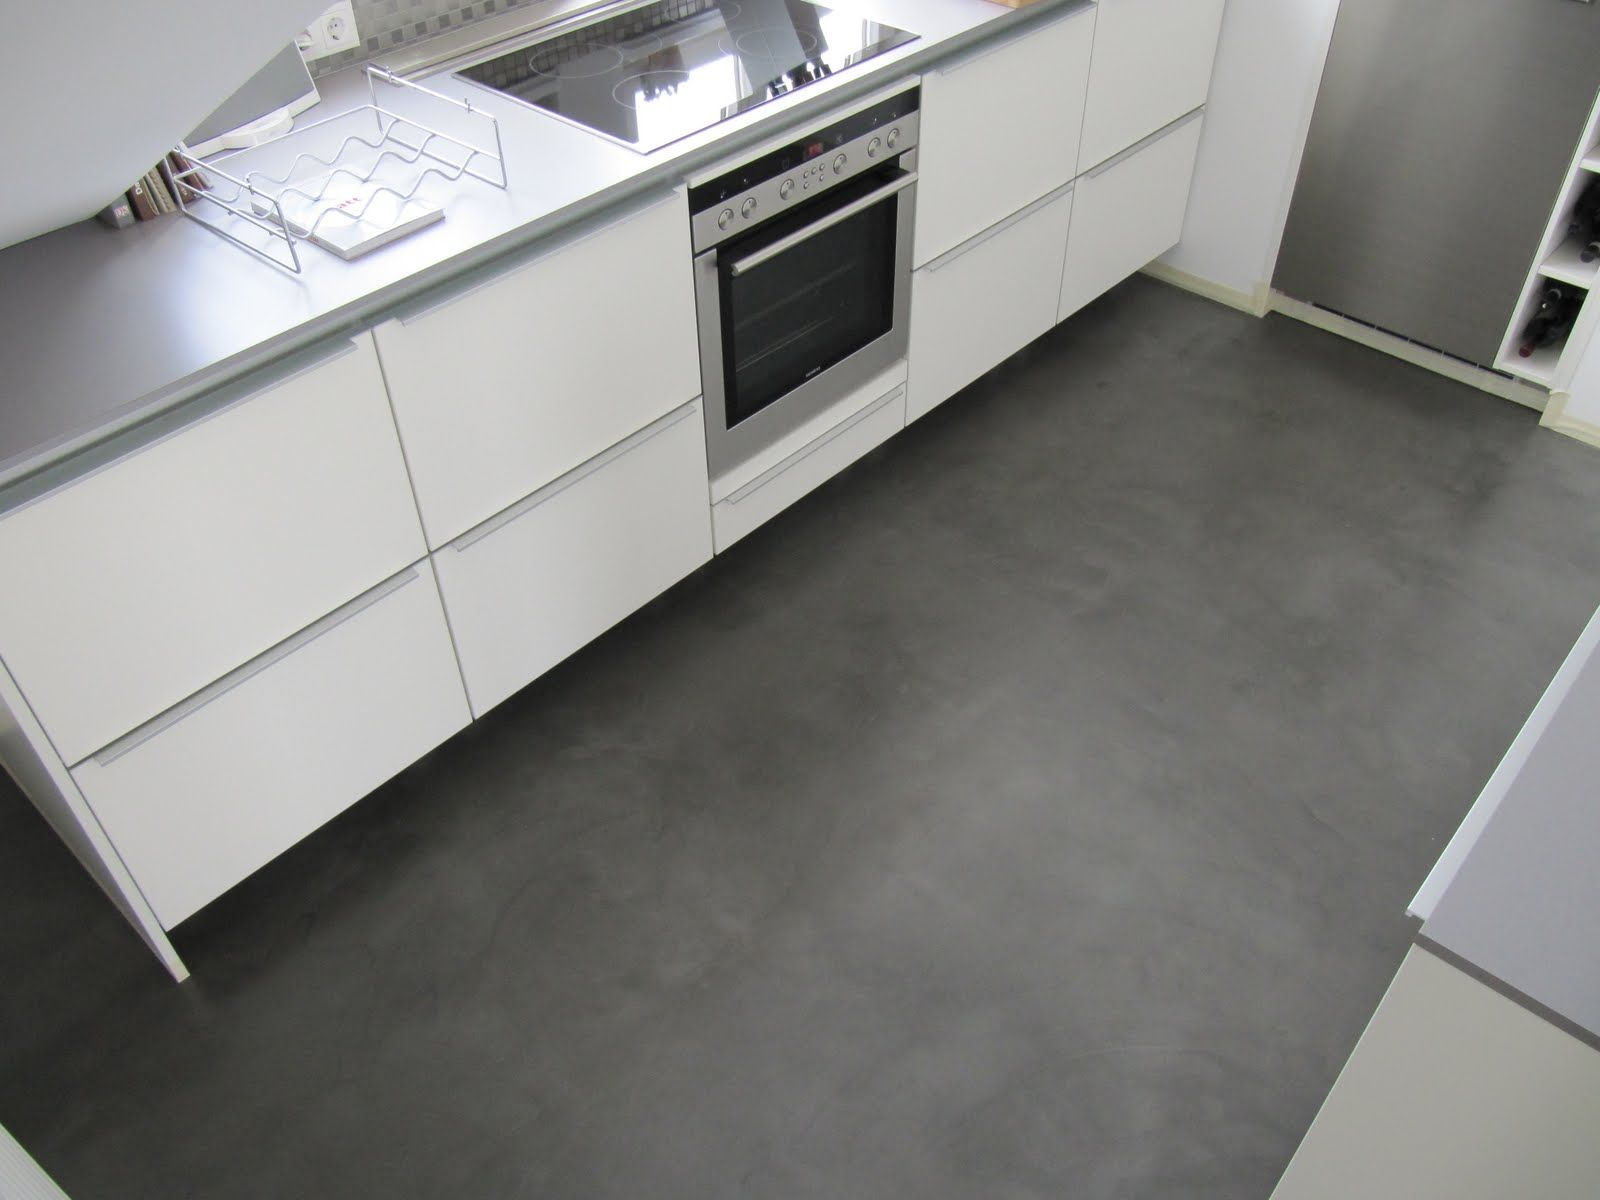 Fußboden Bad Beton ~ Pu beschichtung badezimmer boden béton brut in der farbe no 5